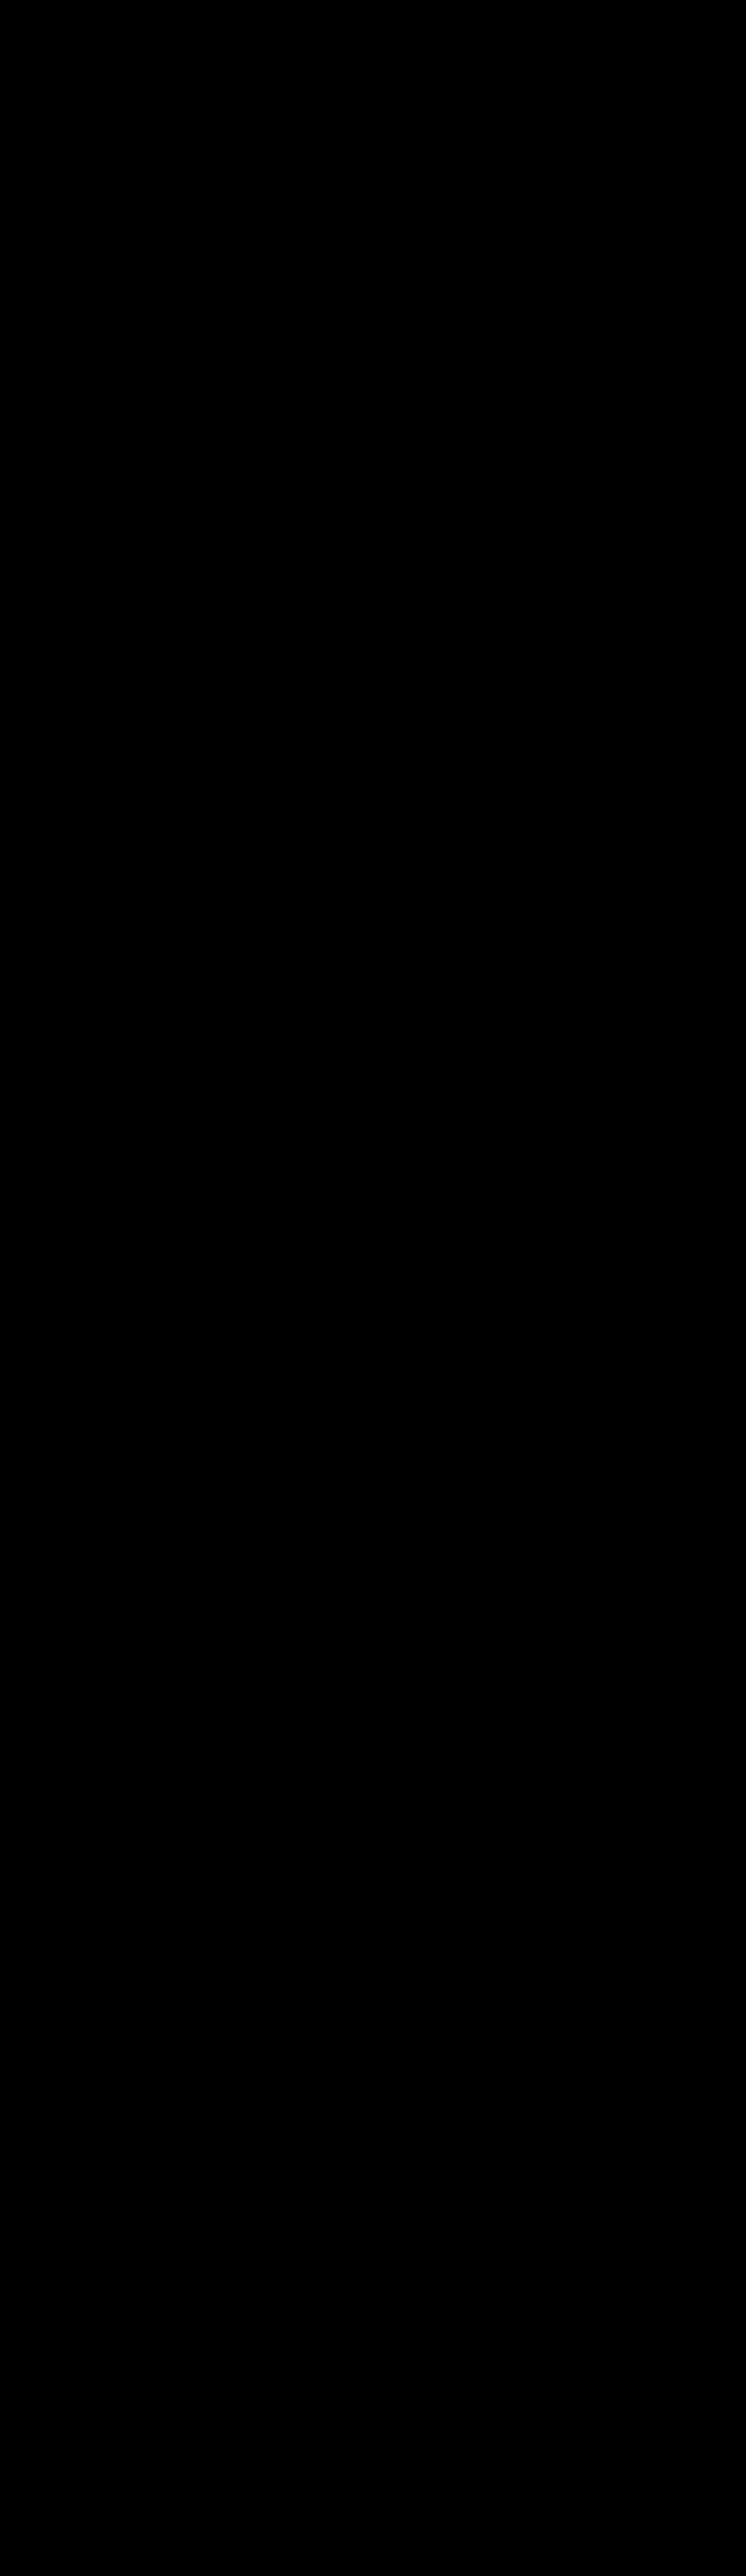 800x2762 Movie Clipart Scroll